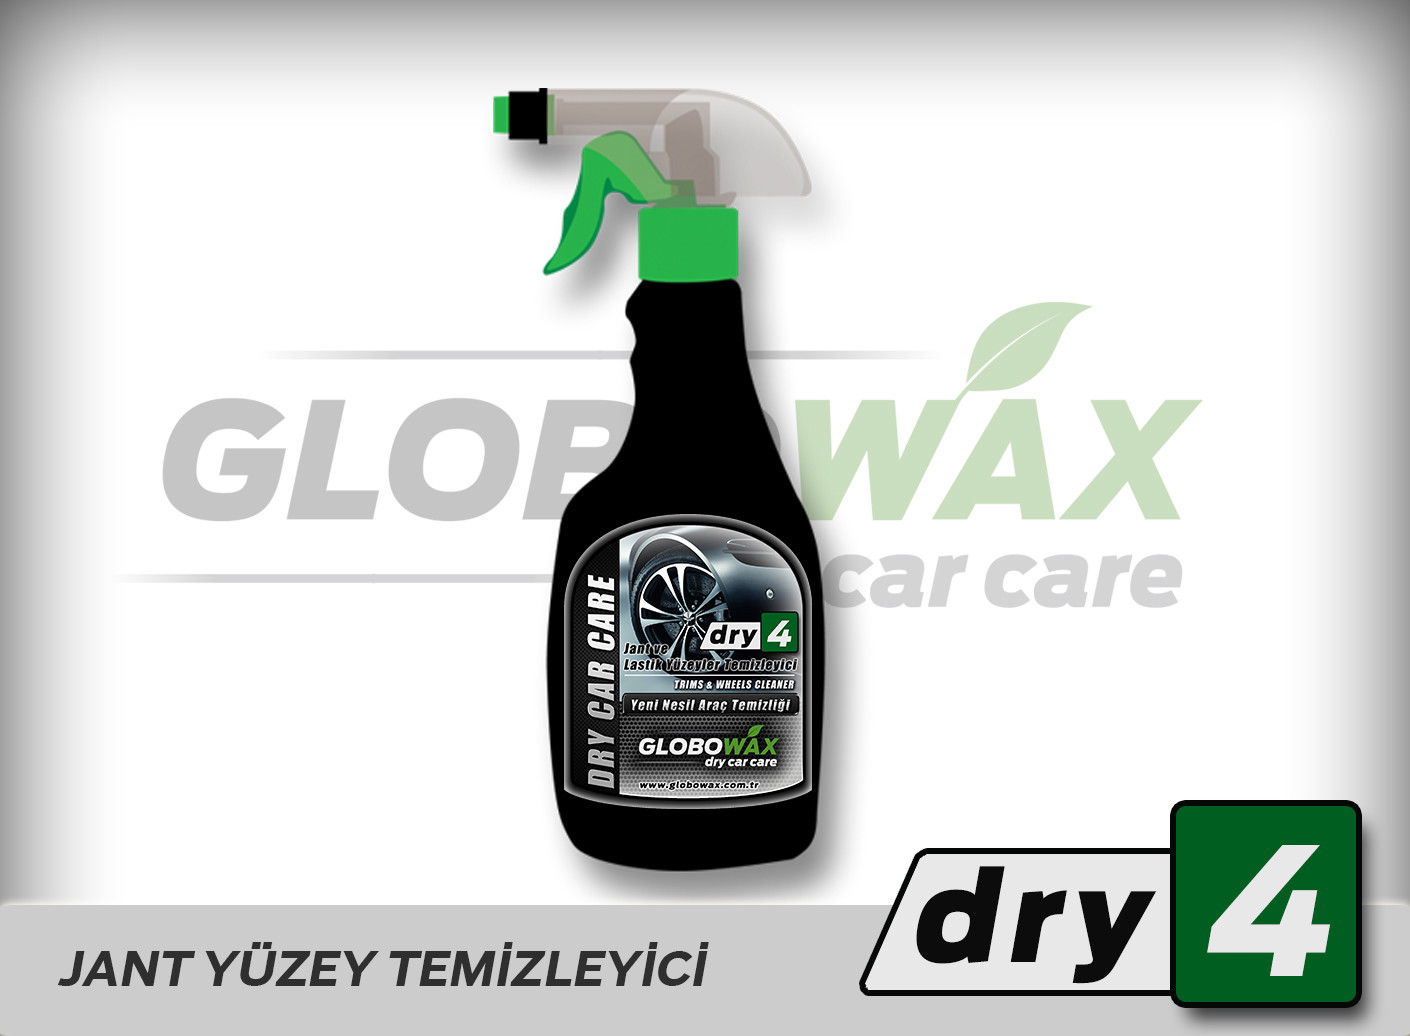 GLOBOWAX-SISE-4-4-4